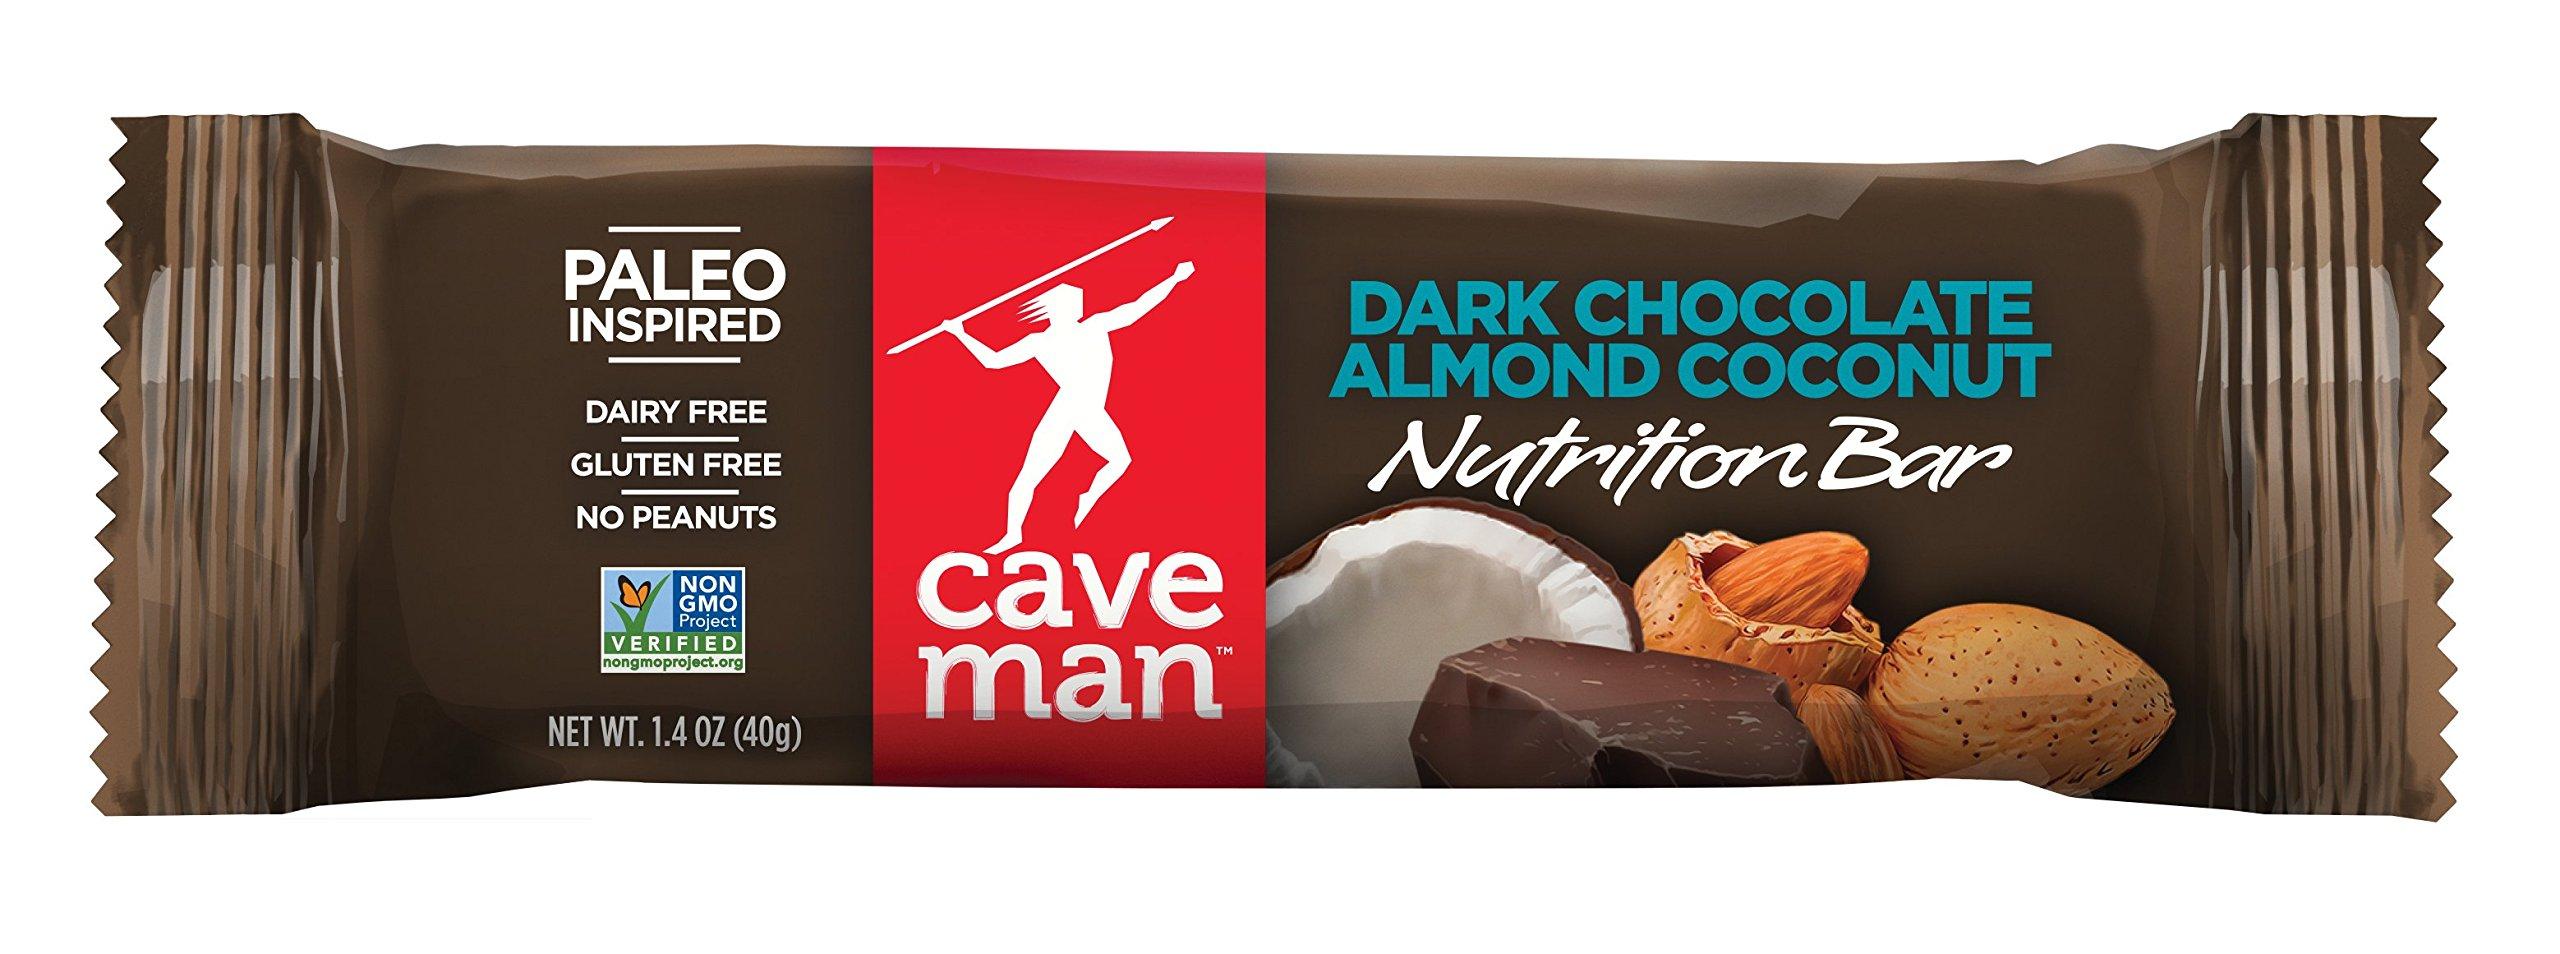 Caveman Foods Paleo-Friendly Nutrition Bar, Dark Chocolate Almond Coconut, 1.4 oz, 15 count